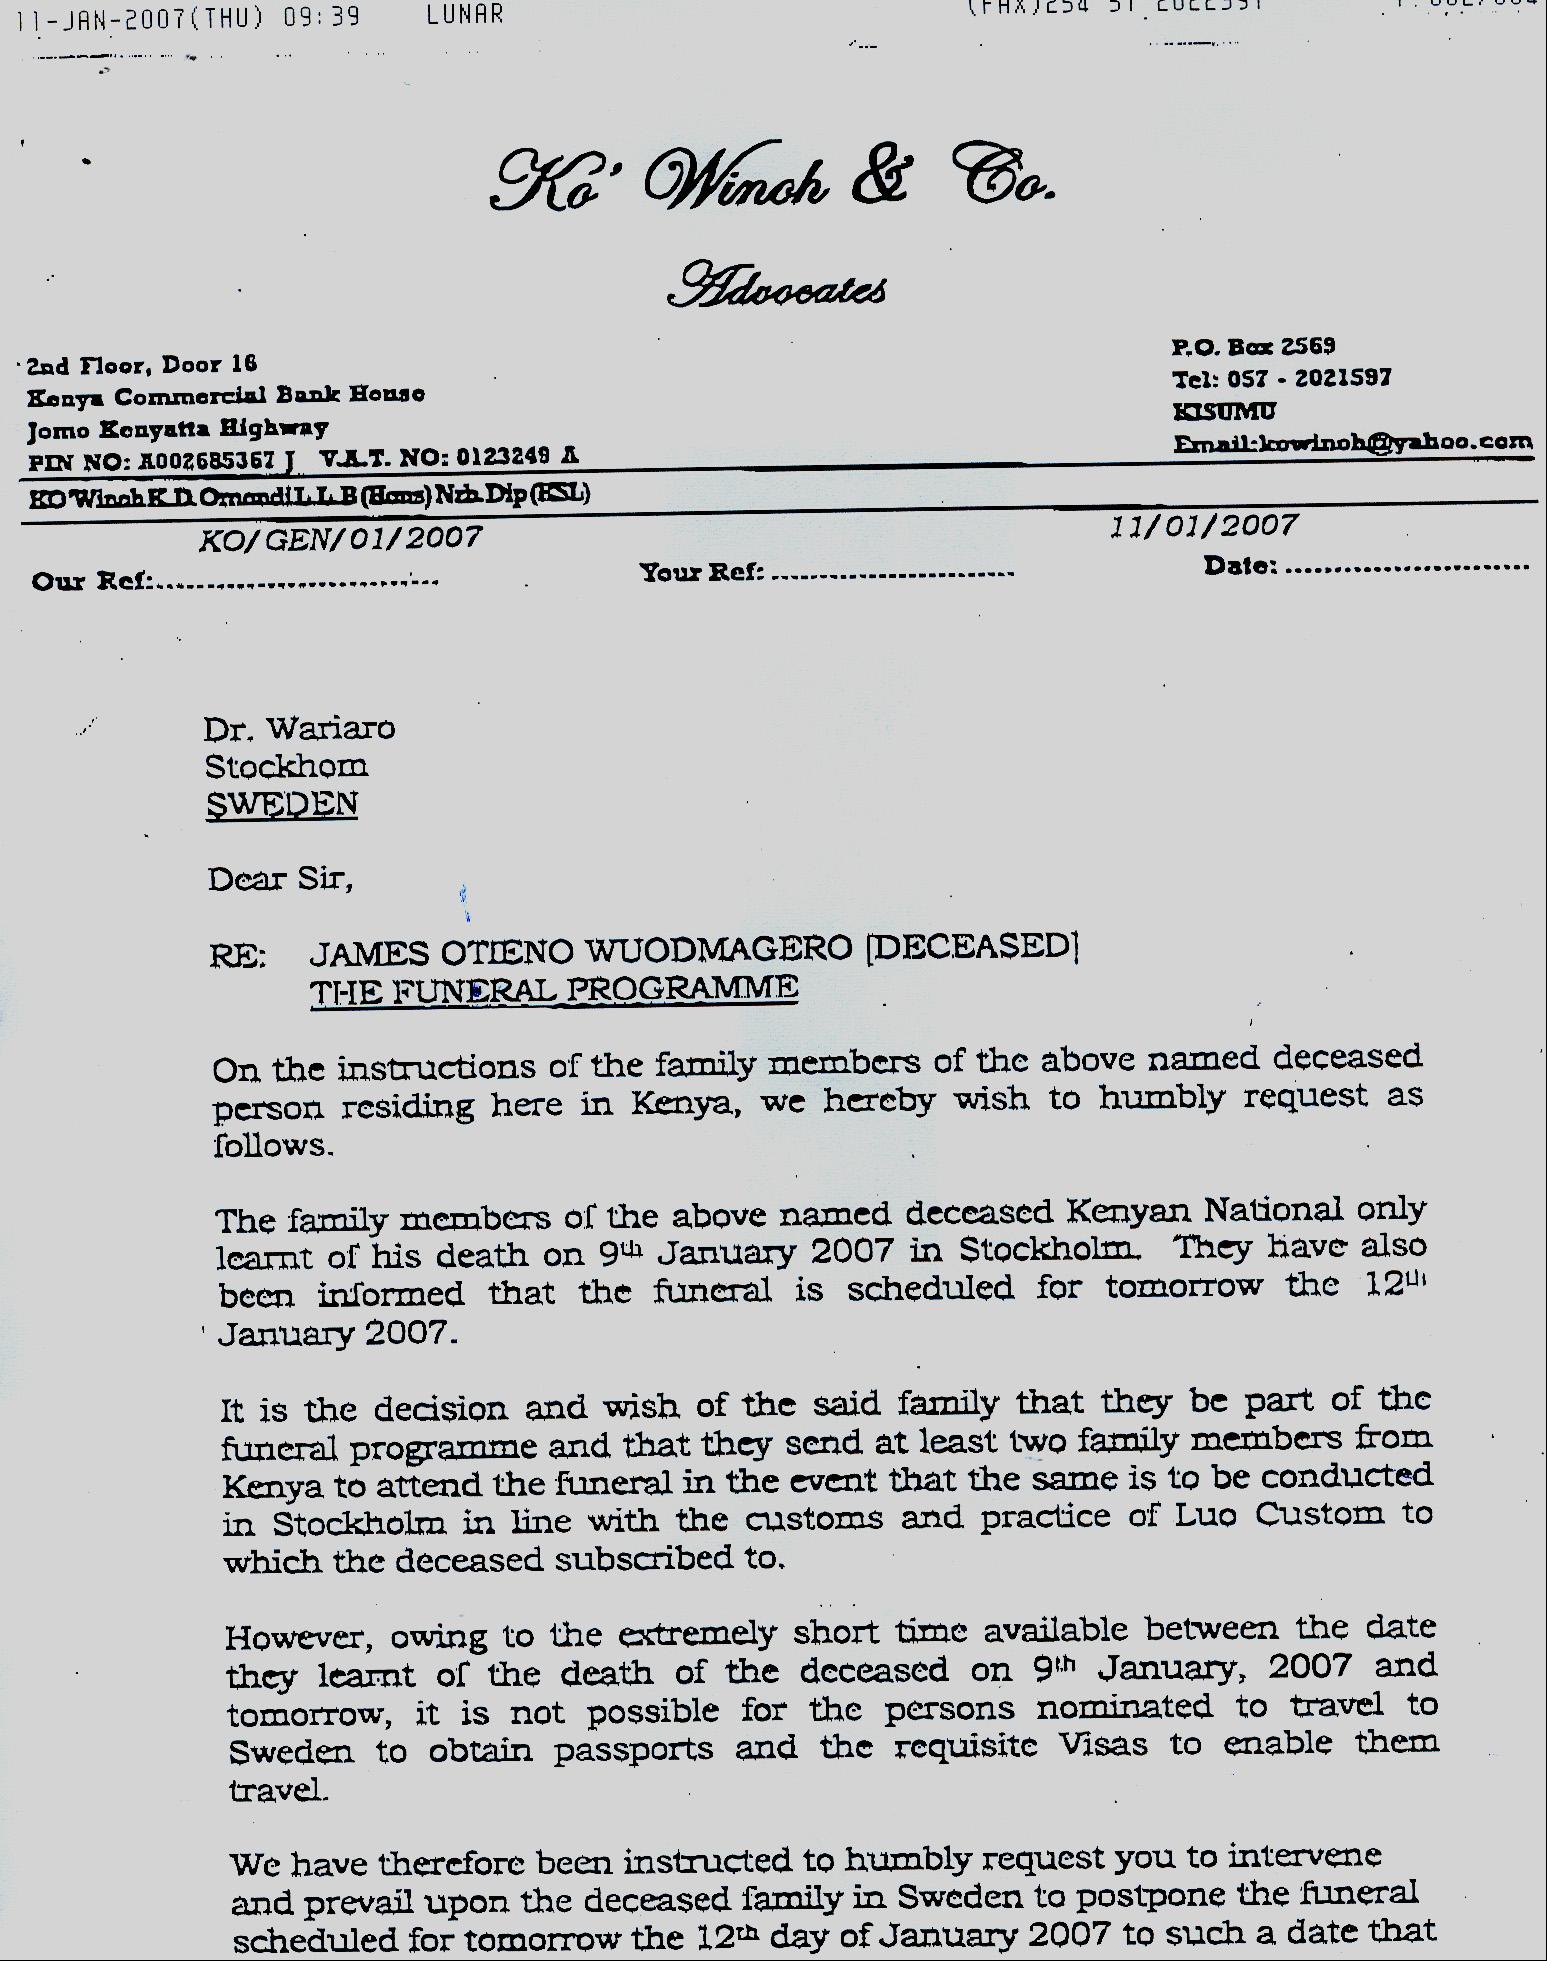 Maggero funeral family sends affidavit seeking to delay process maggero1 stopboris Choice Image